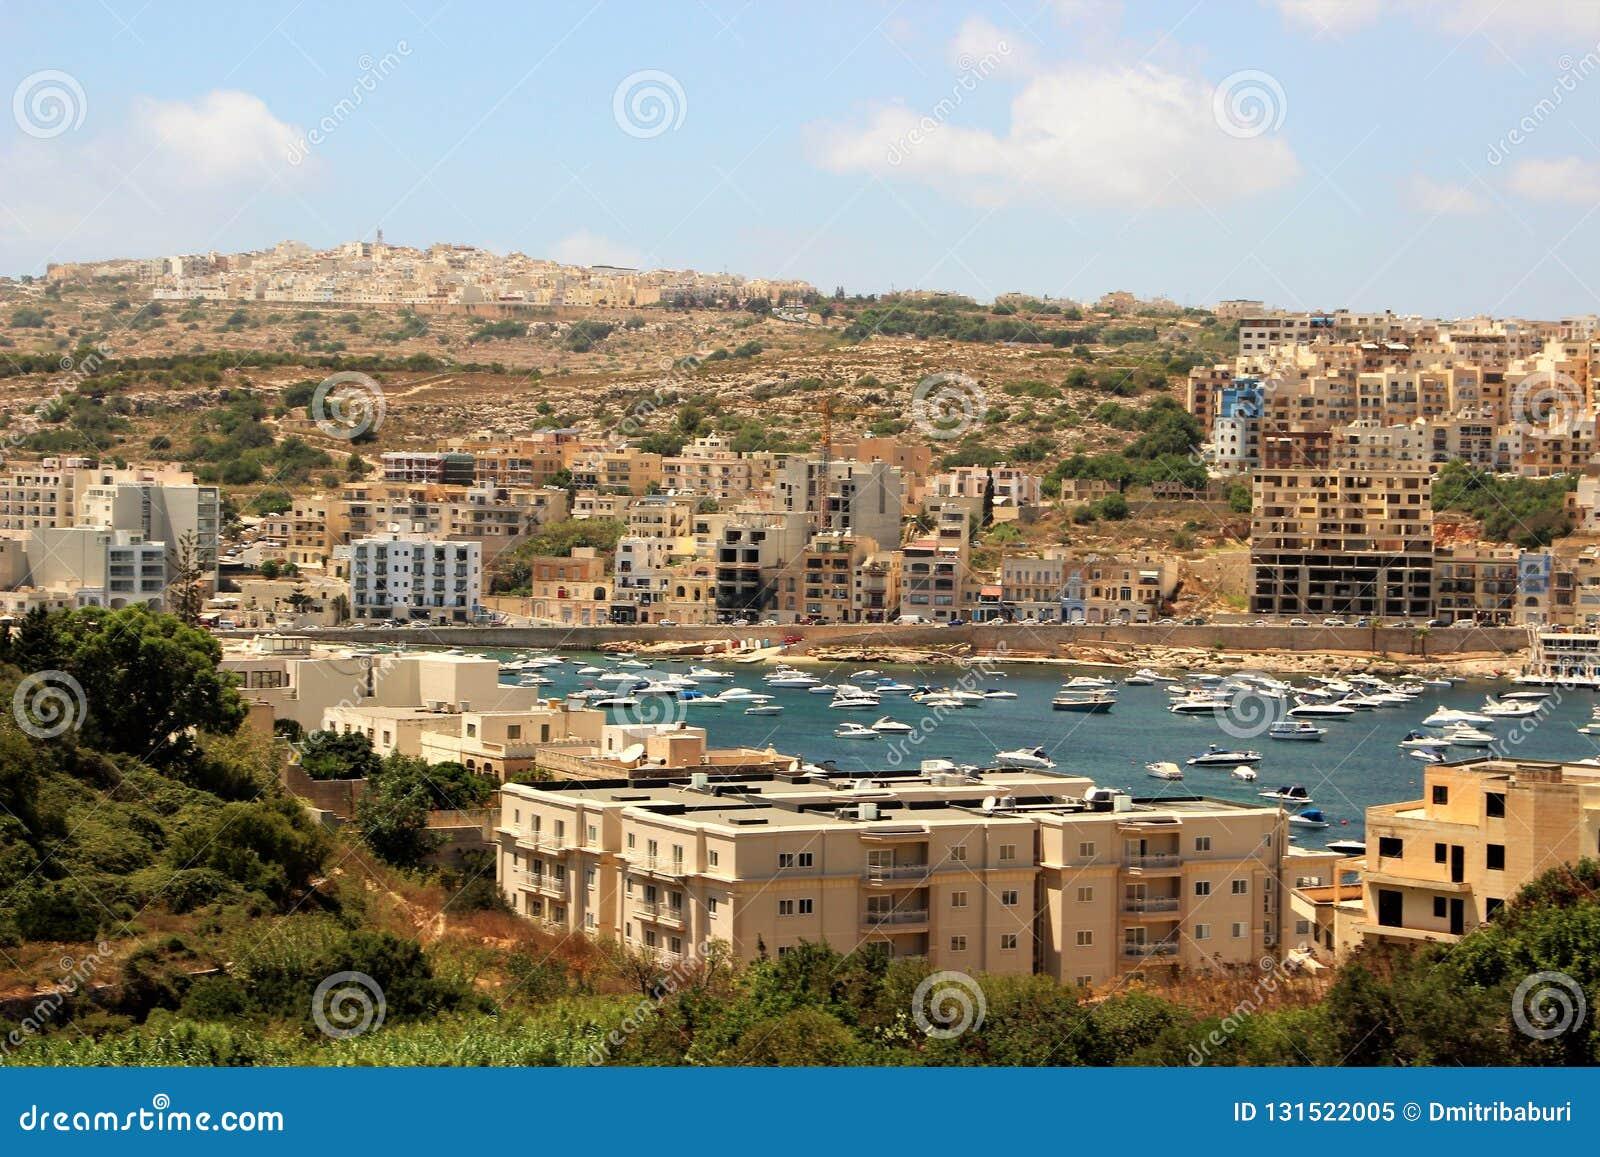 Vista bonita da cidade de estância balnear na ponta da ilha de Malta